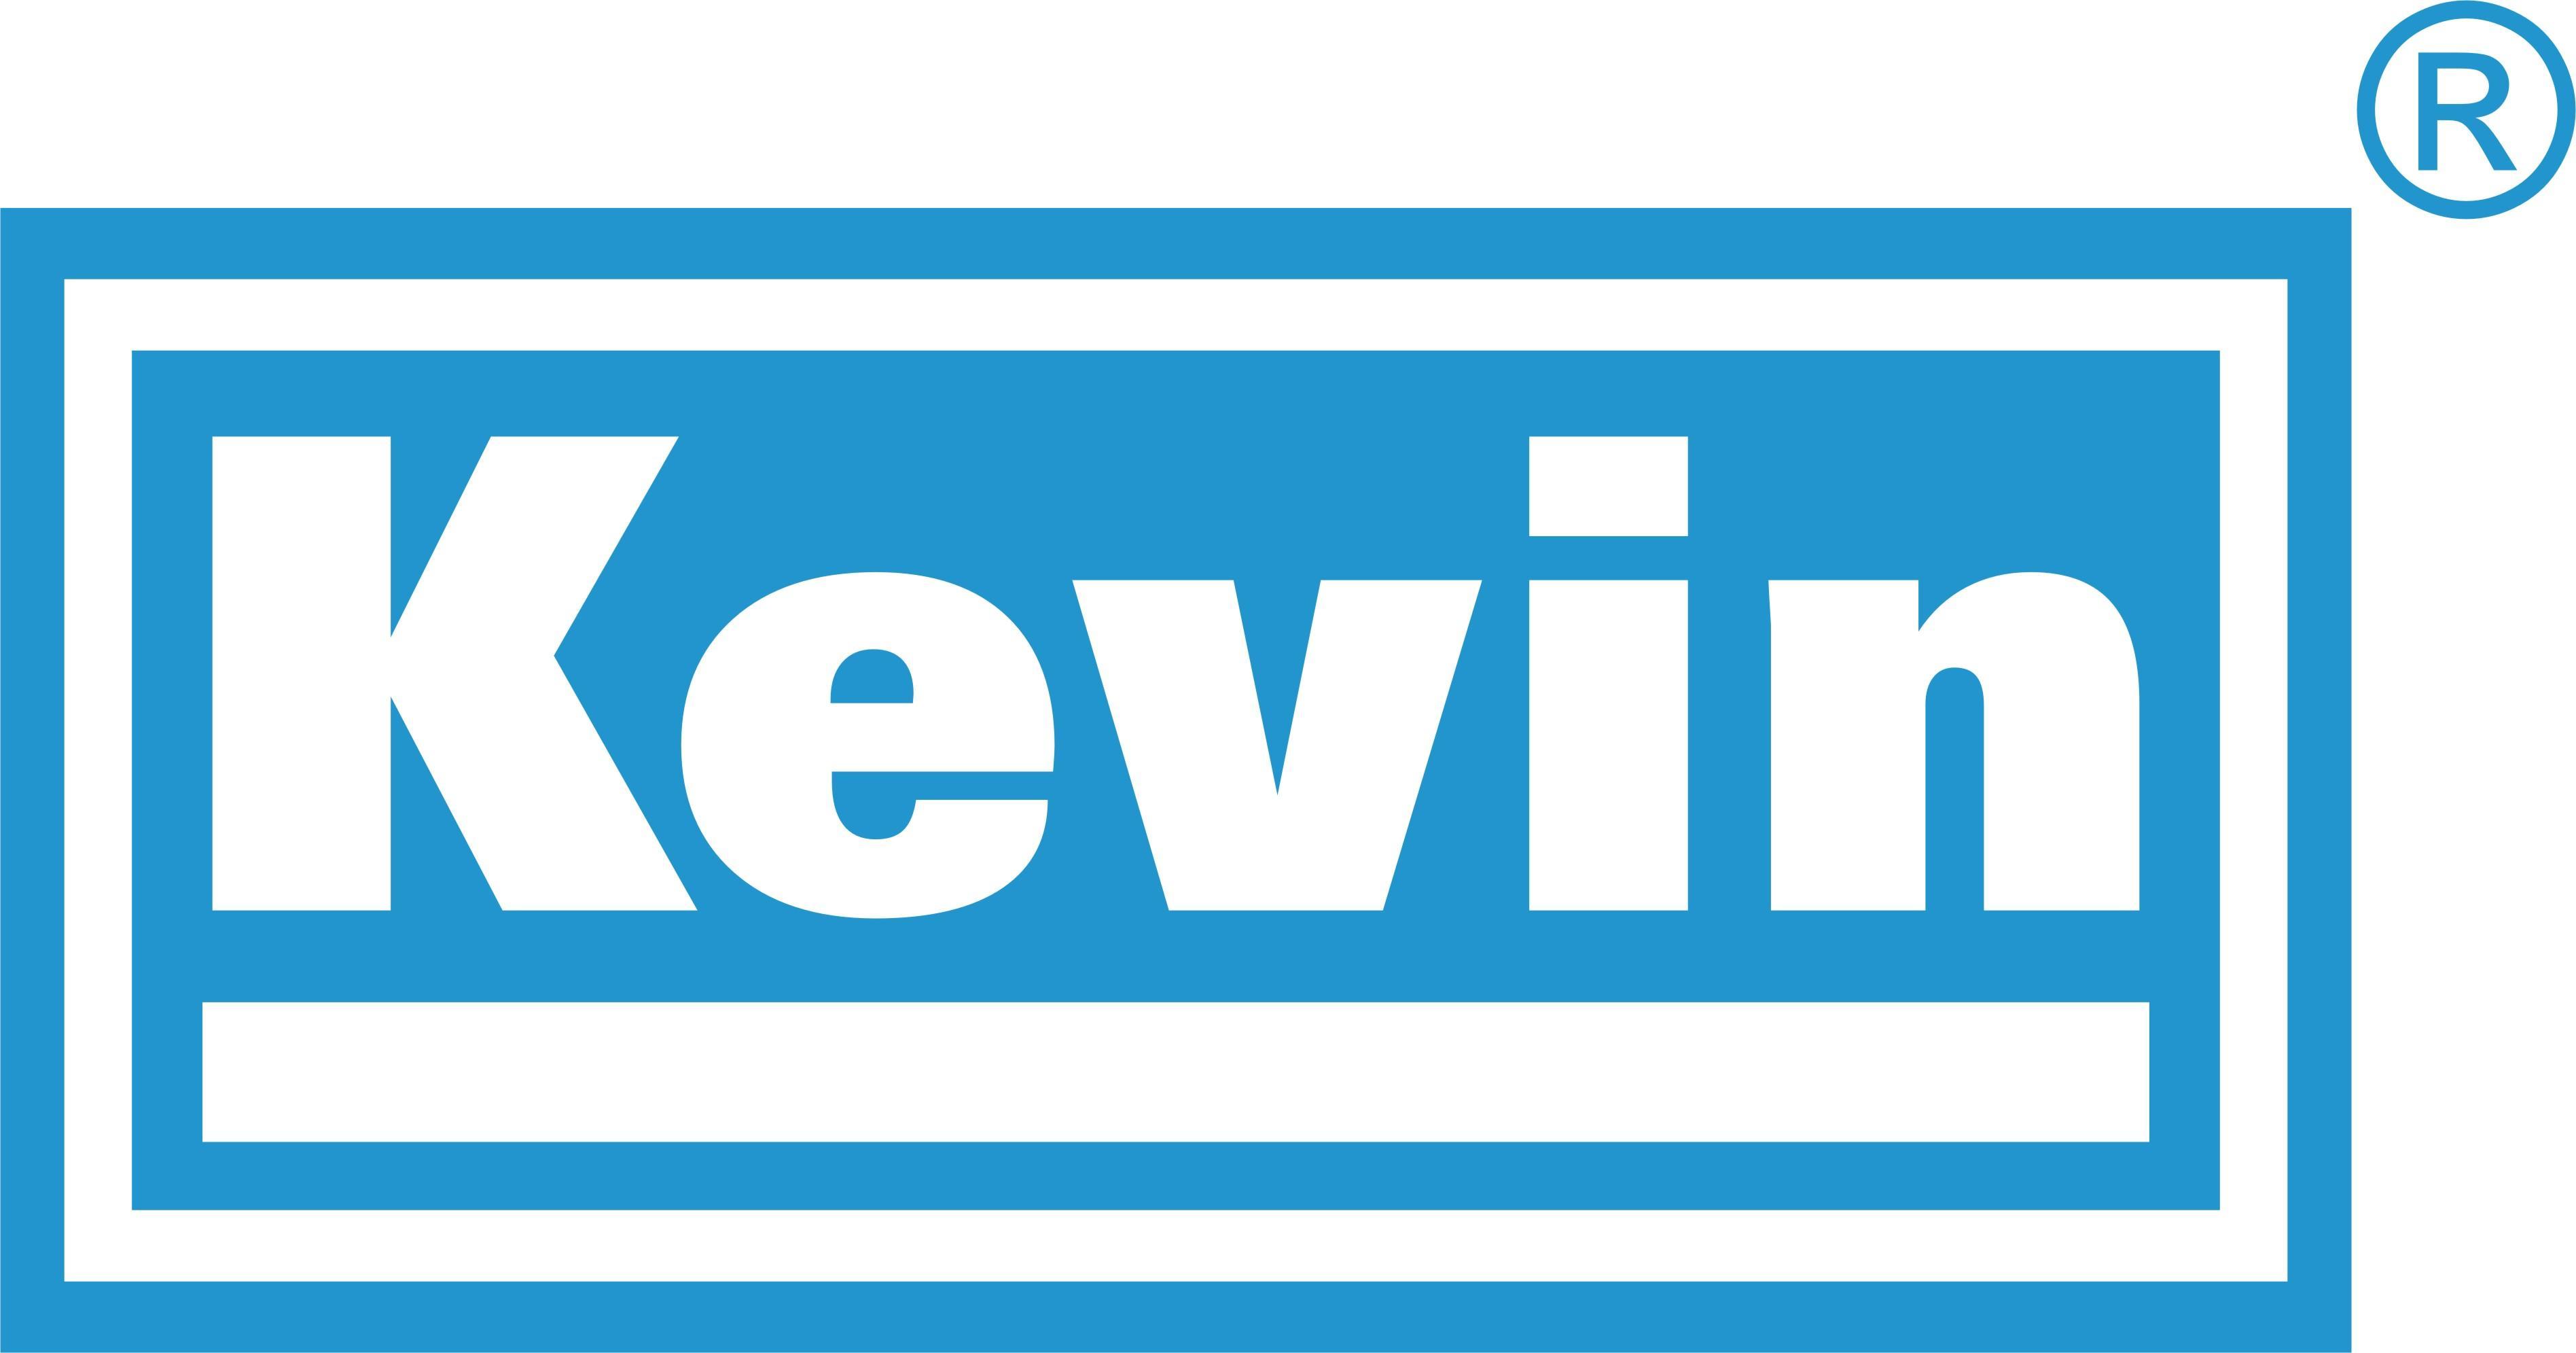 KEVIN PROCESS TECHNOLOGIES PVT. LTD & KEVISION SYSTEMS PVT. LTD.